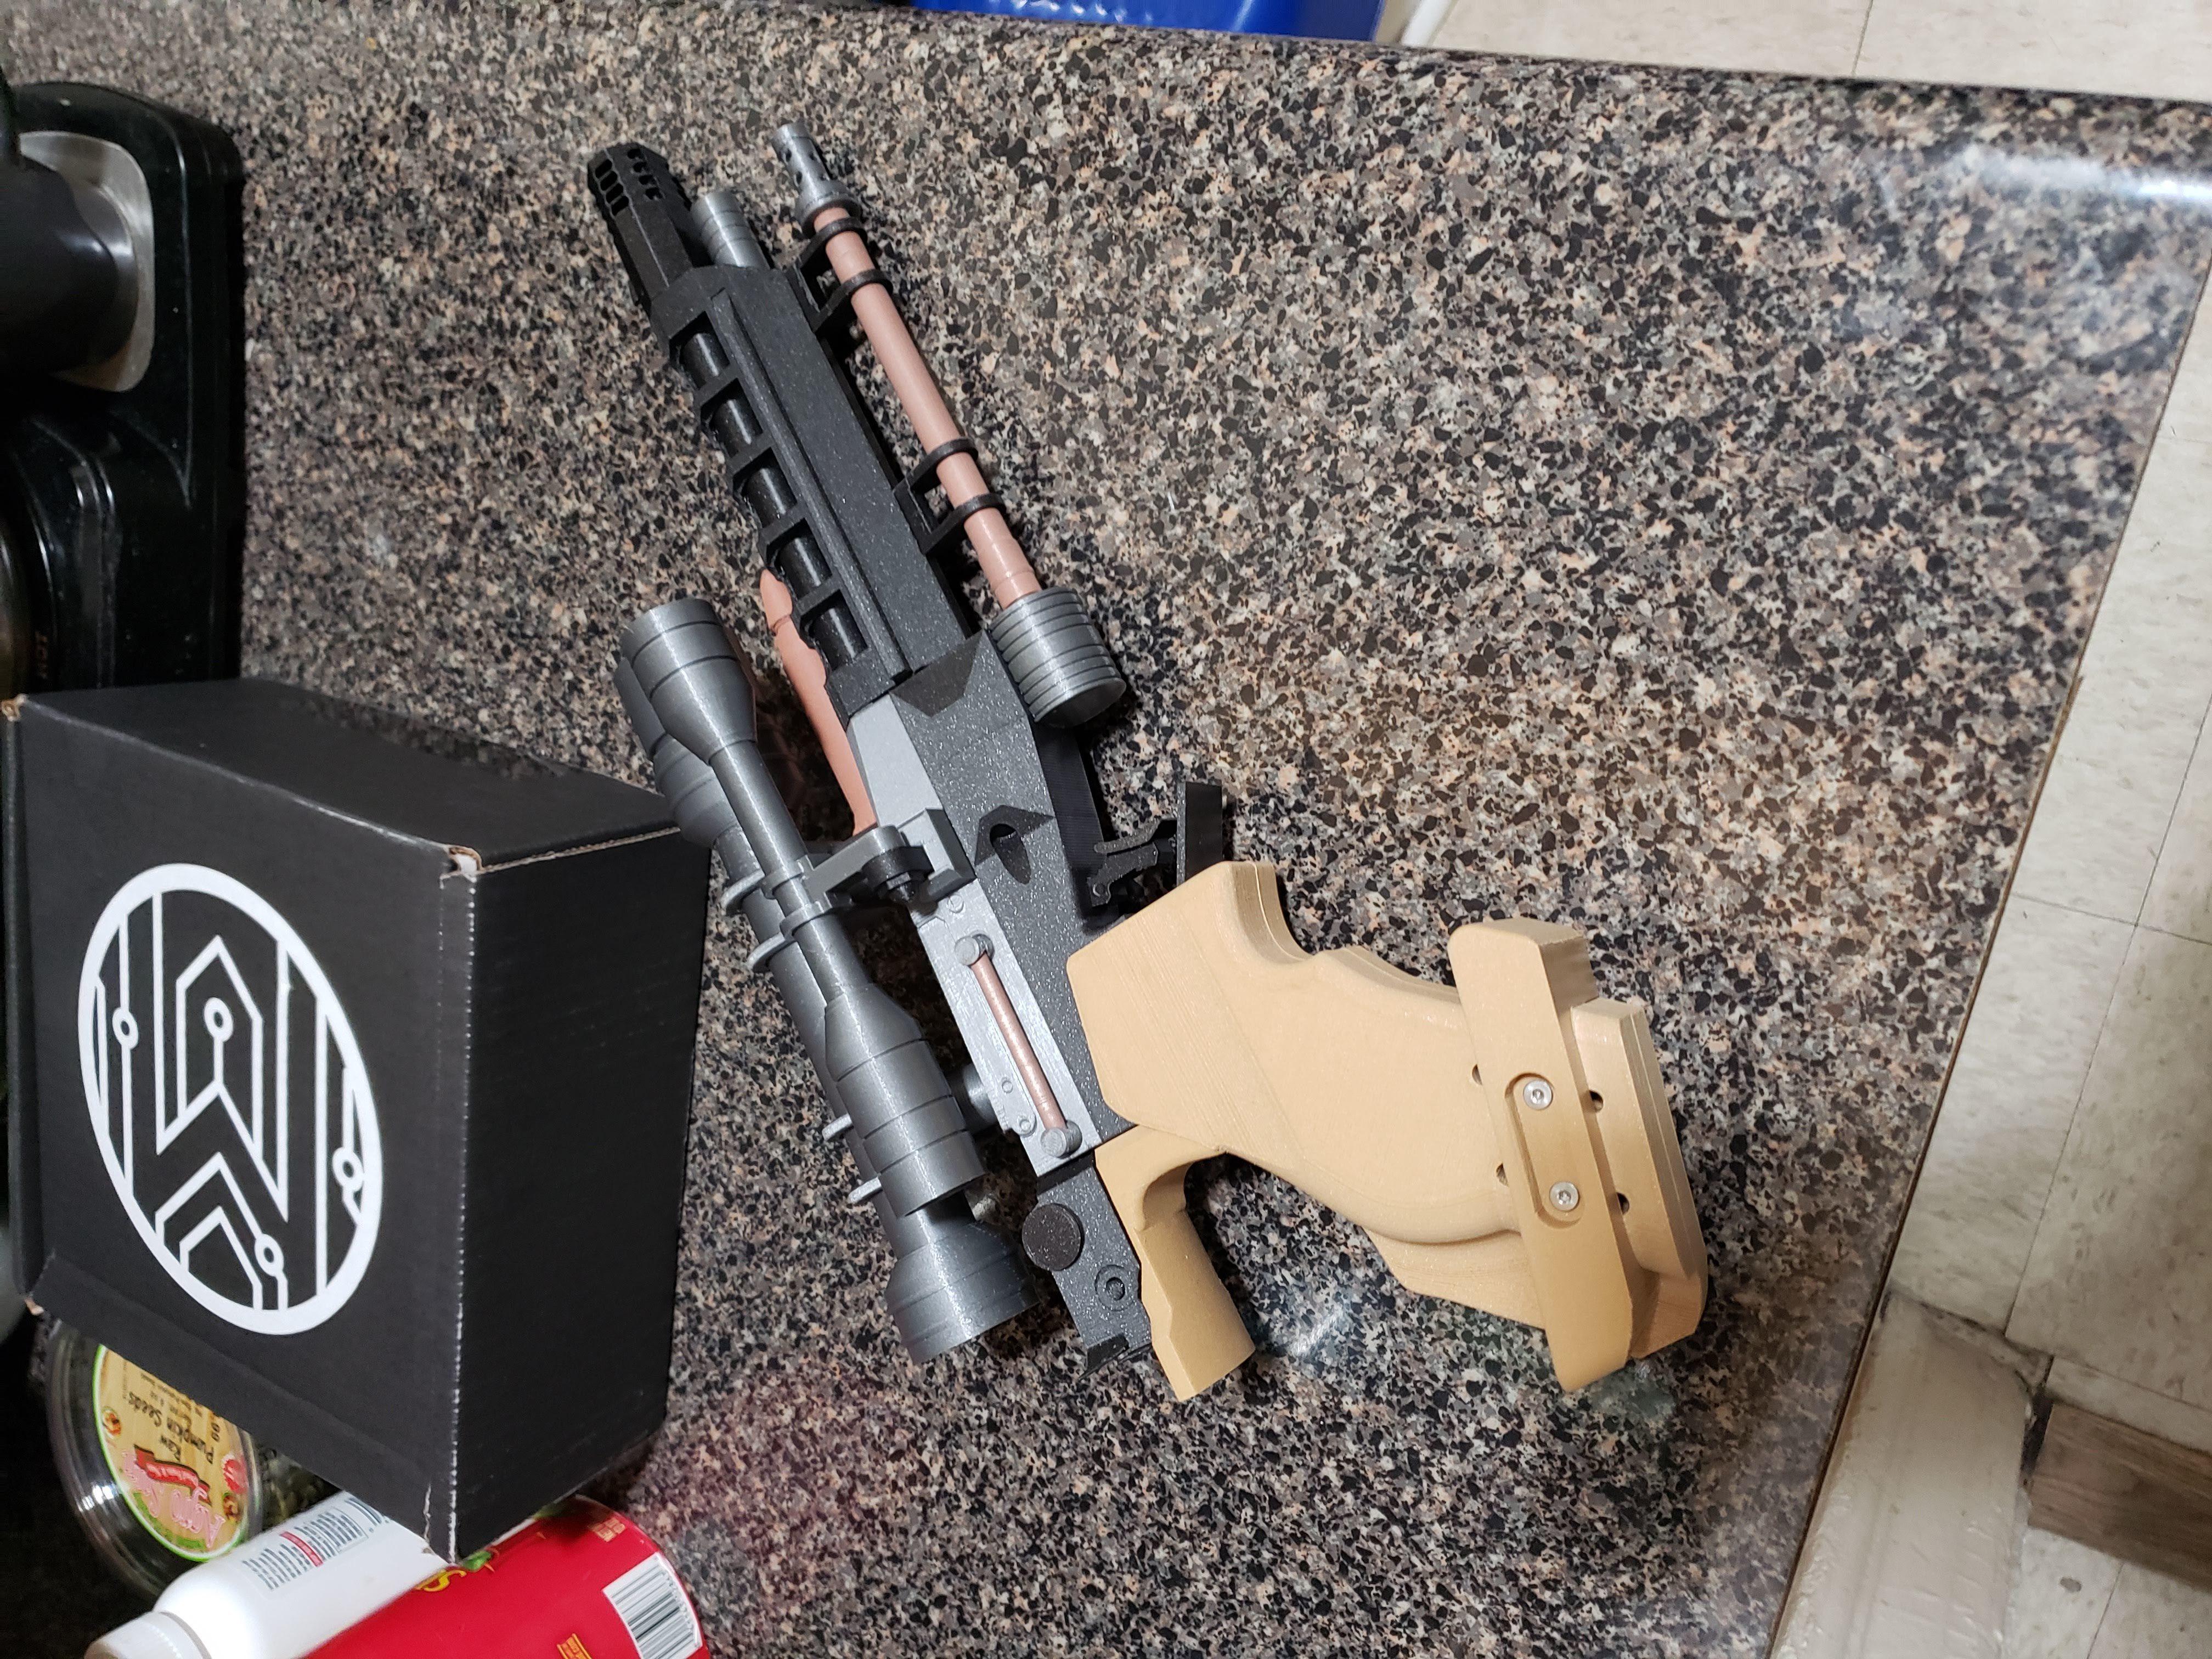 20190205_232653.jpg Download free STL file Star Wars Naboo S5 Heavy Blaster Pistol • 3D printing design, Dsk